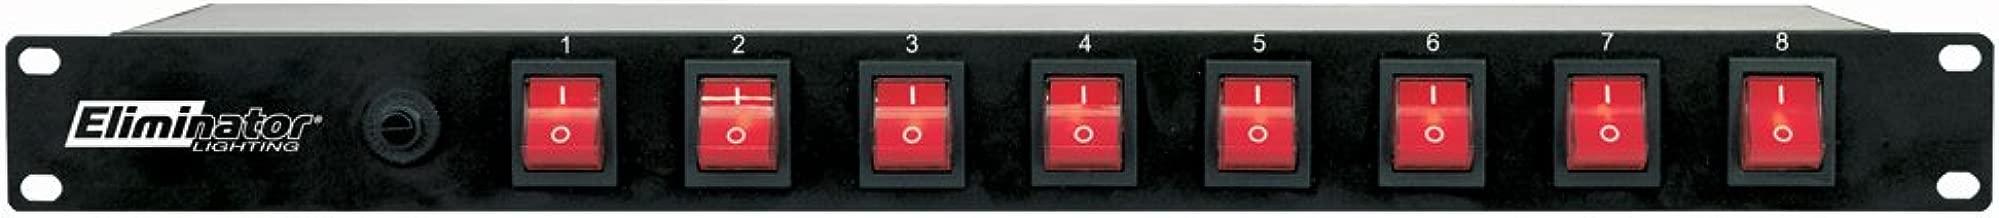 Eliminator Stage Light Accessory, Original Version (E107)